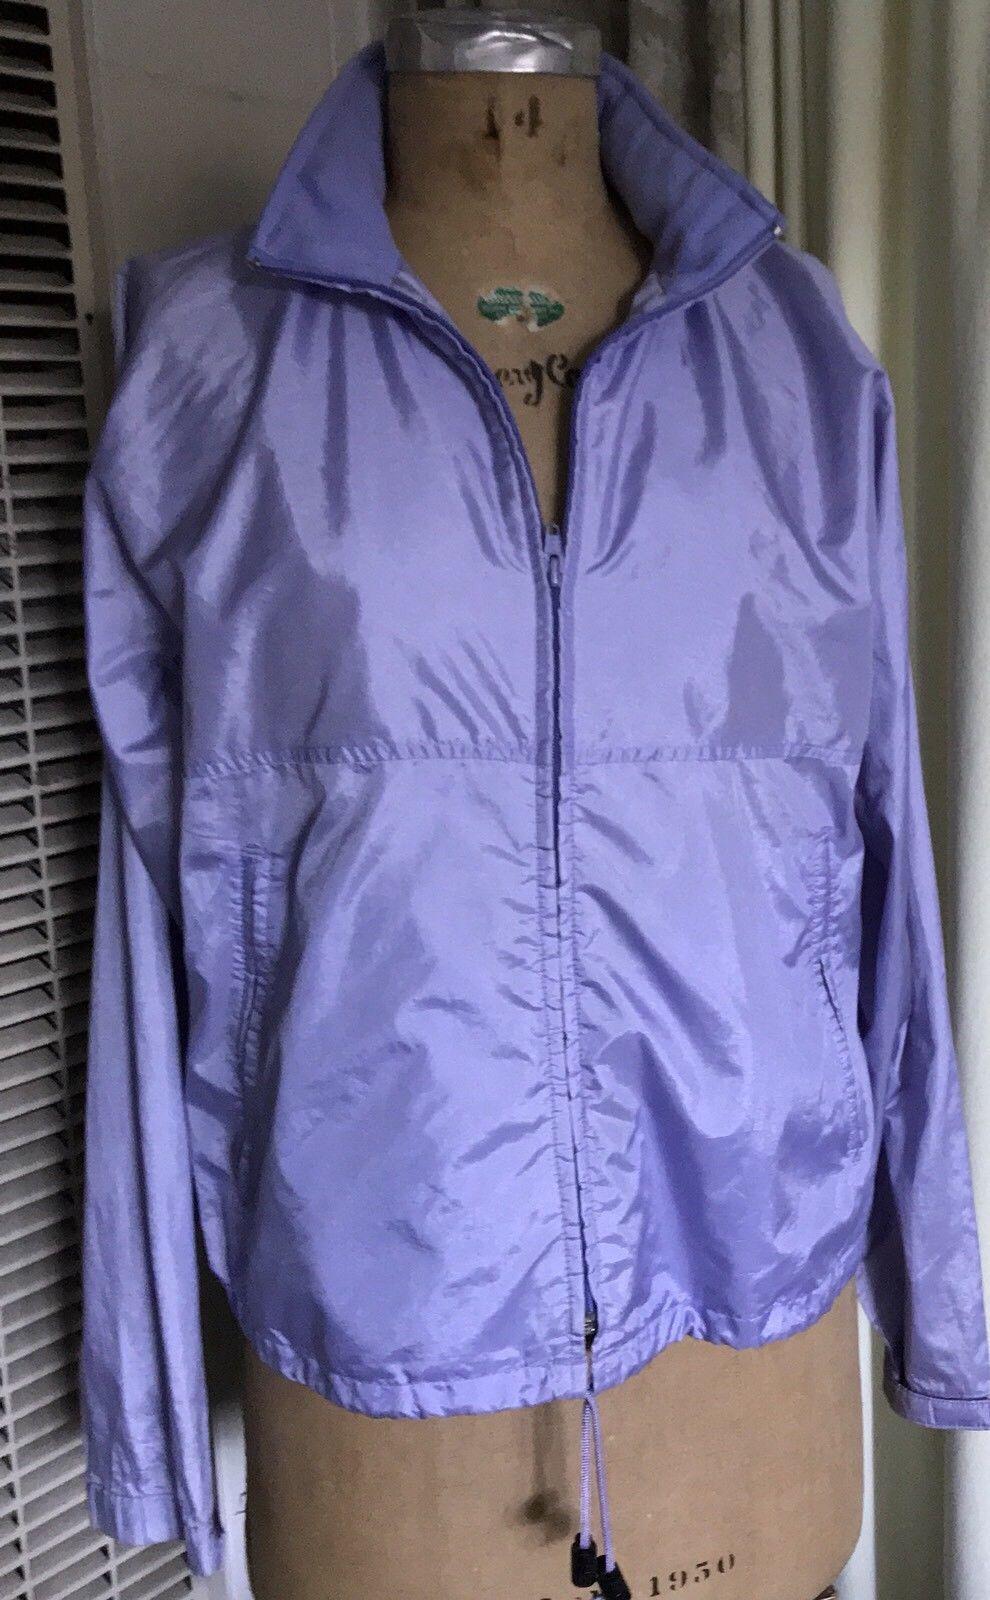 S l1600. S l1600. Previous. Vintage Womens LL Bean Lavender Light Purple  Windbreaker ... 4c1331e599